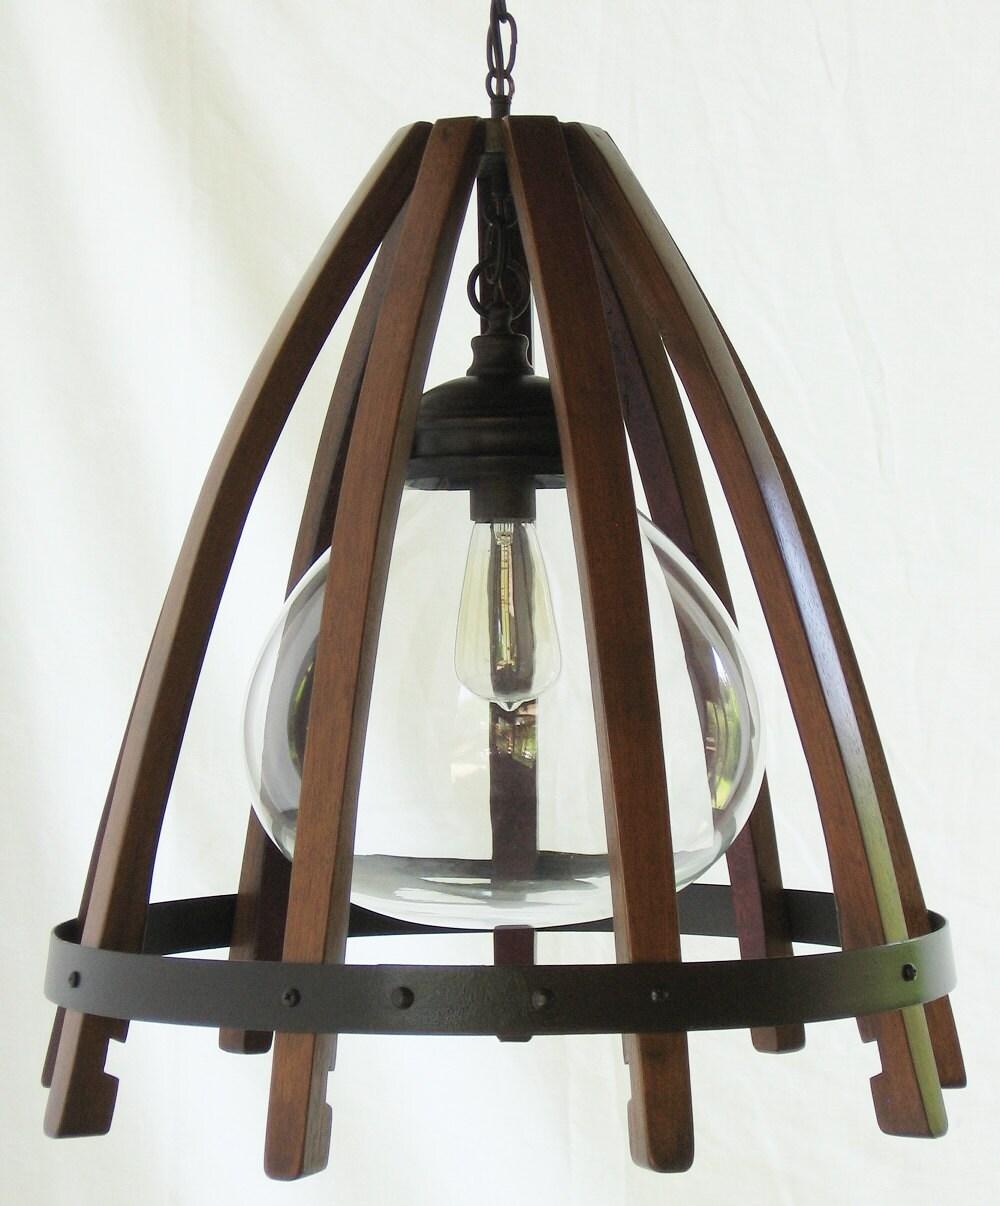 Medusa recycled oak wine barrel staves hoop hanging pendant for Medusa light fixture